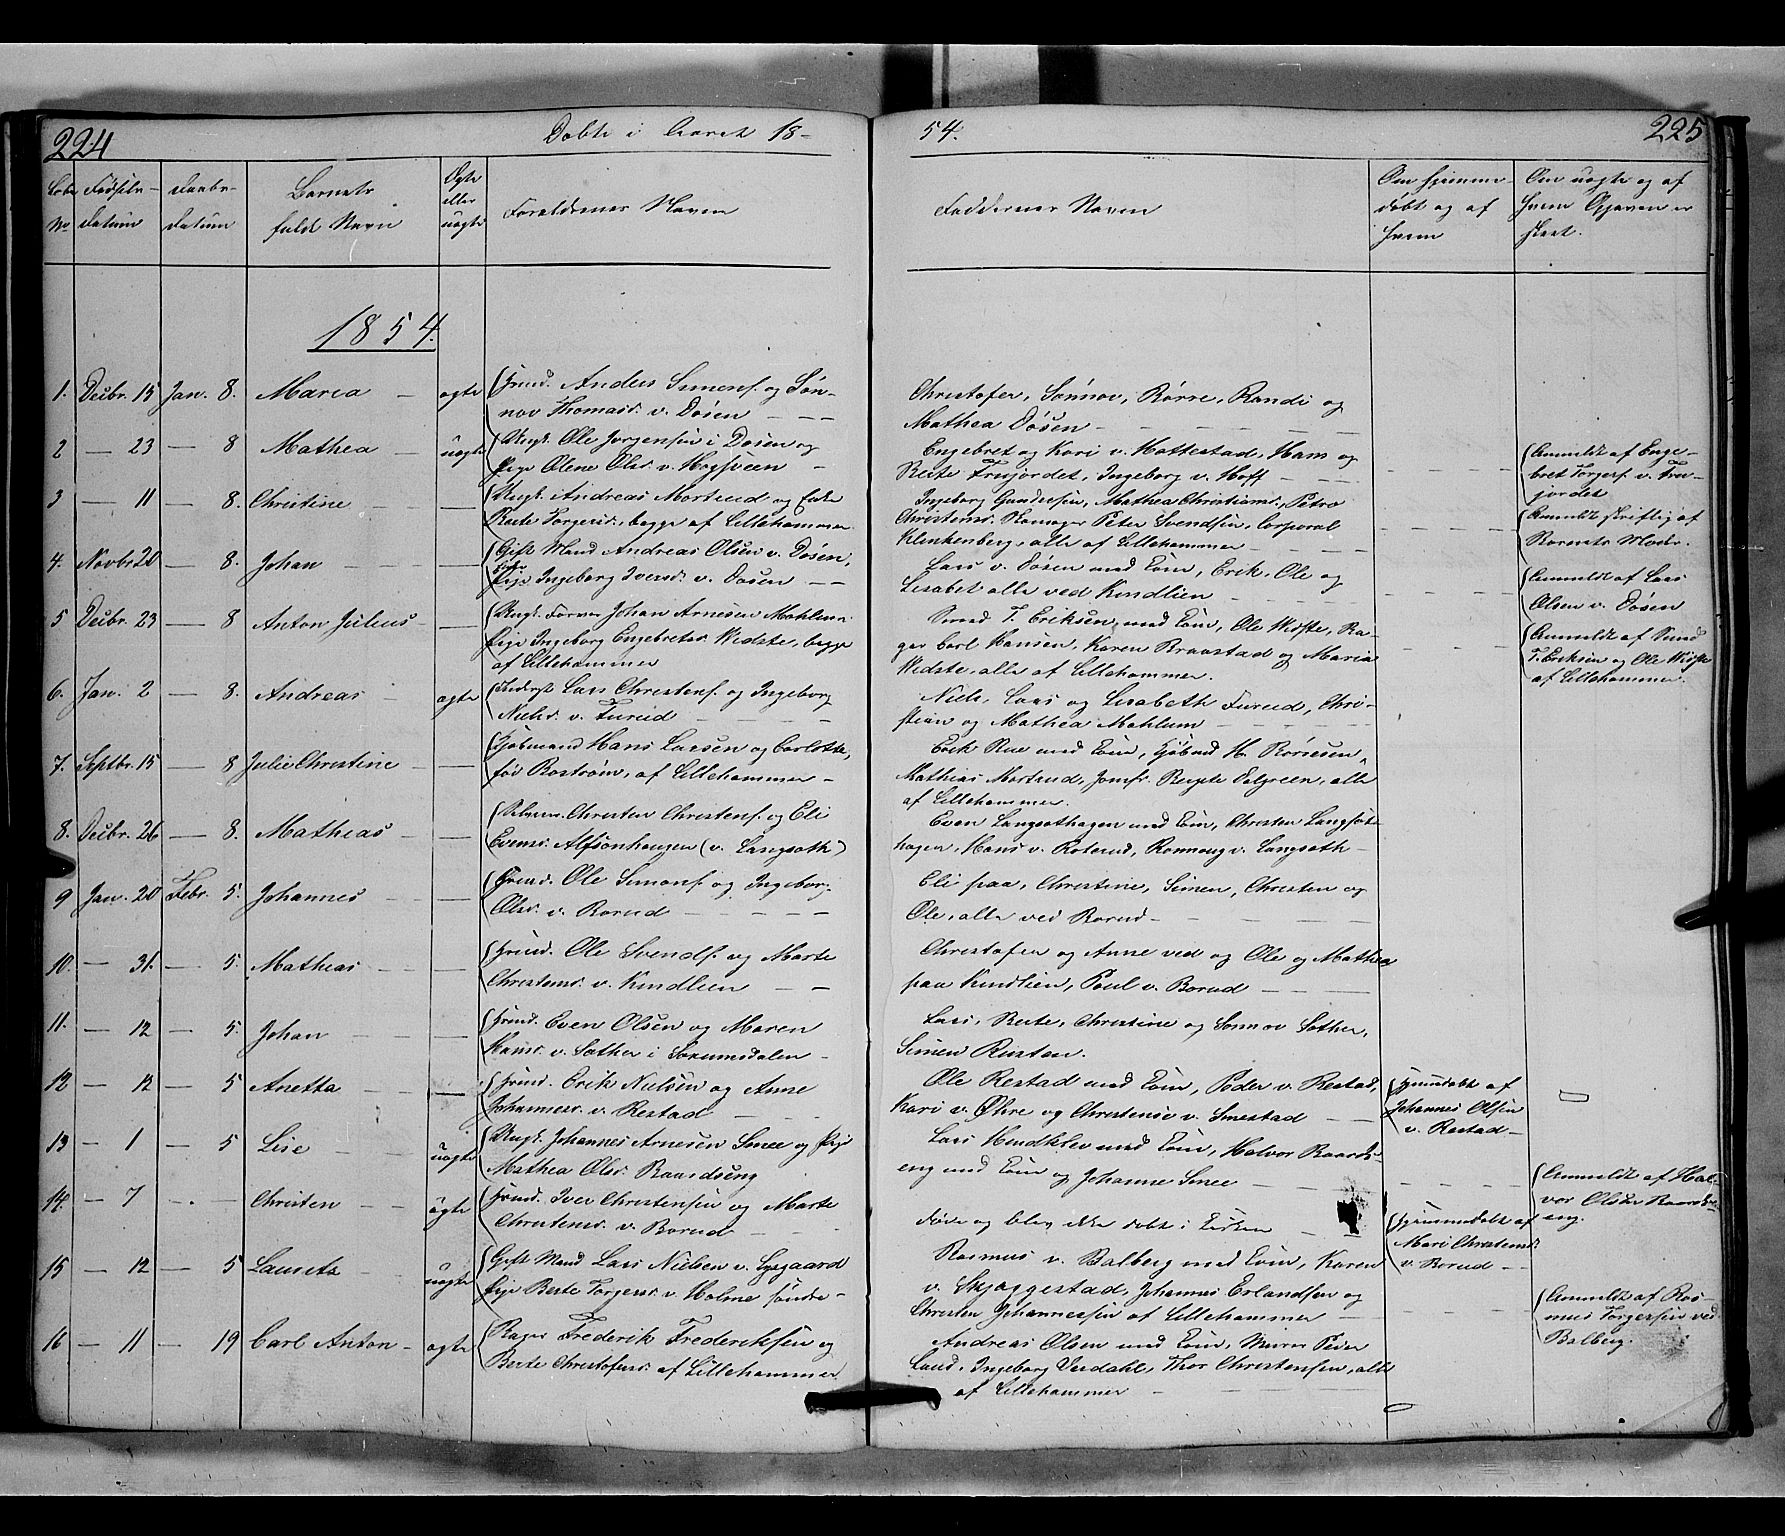 SAH, Fåberg prestekontor, Klokkerbok nr. 6, 1837-1855, s. 224-225